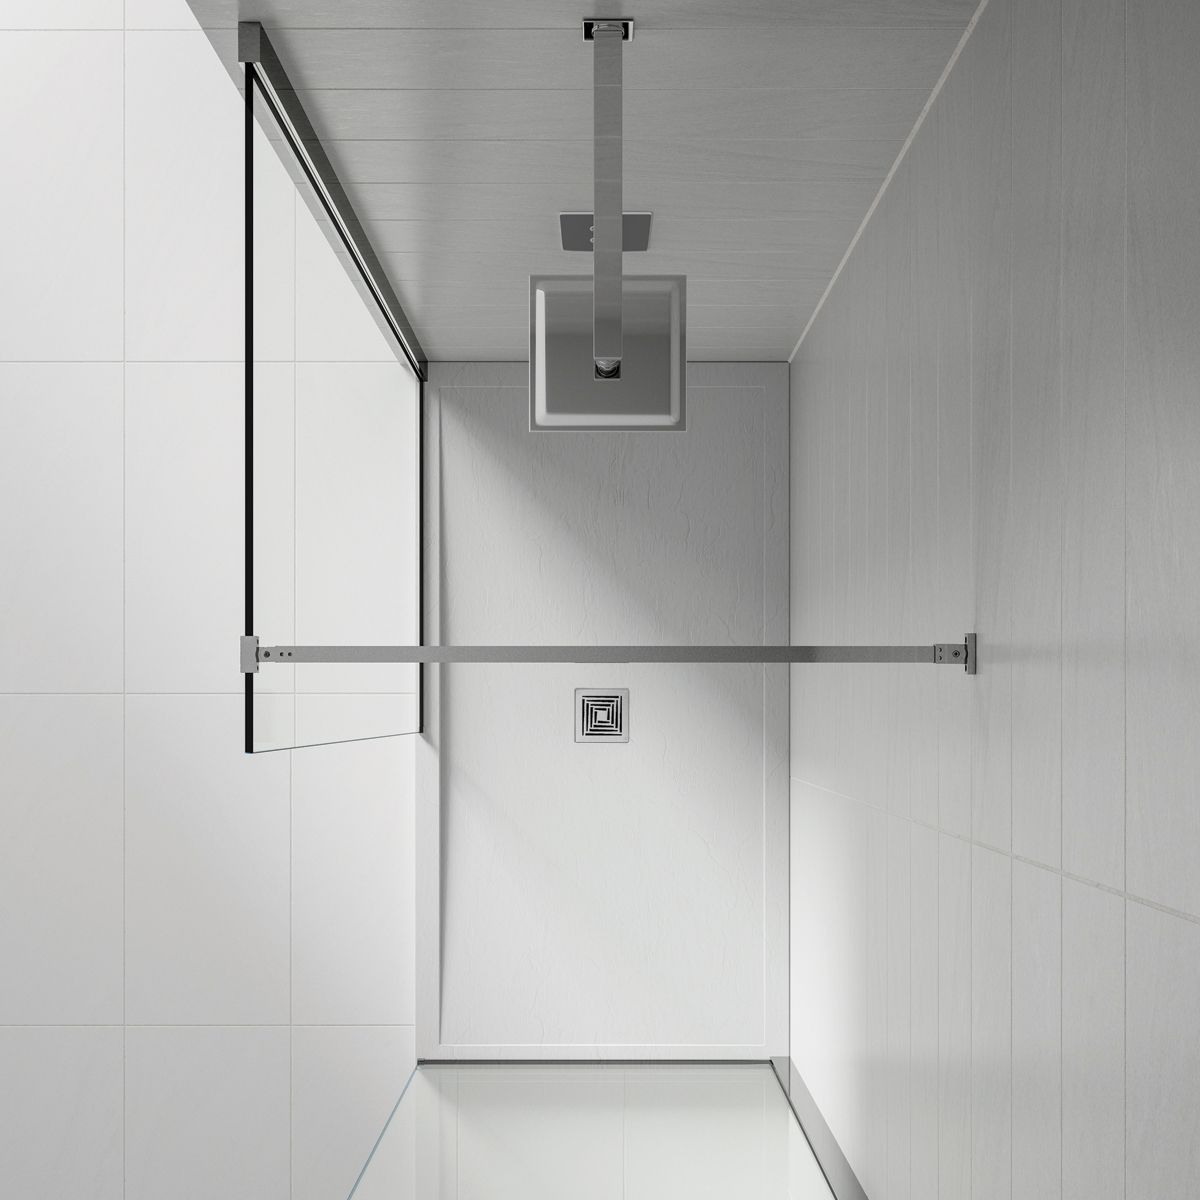 Aquadart White Slate Shower Tray 1700 x 700 Overhead